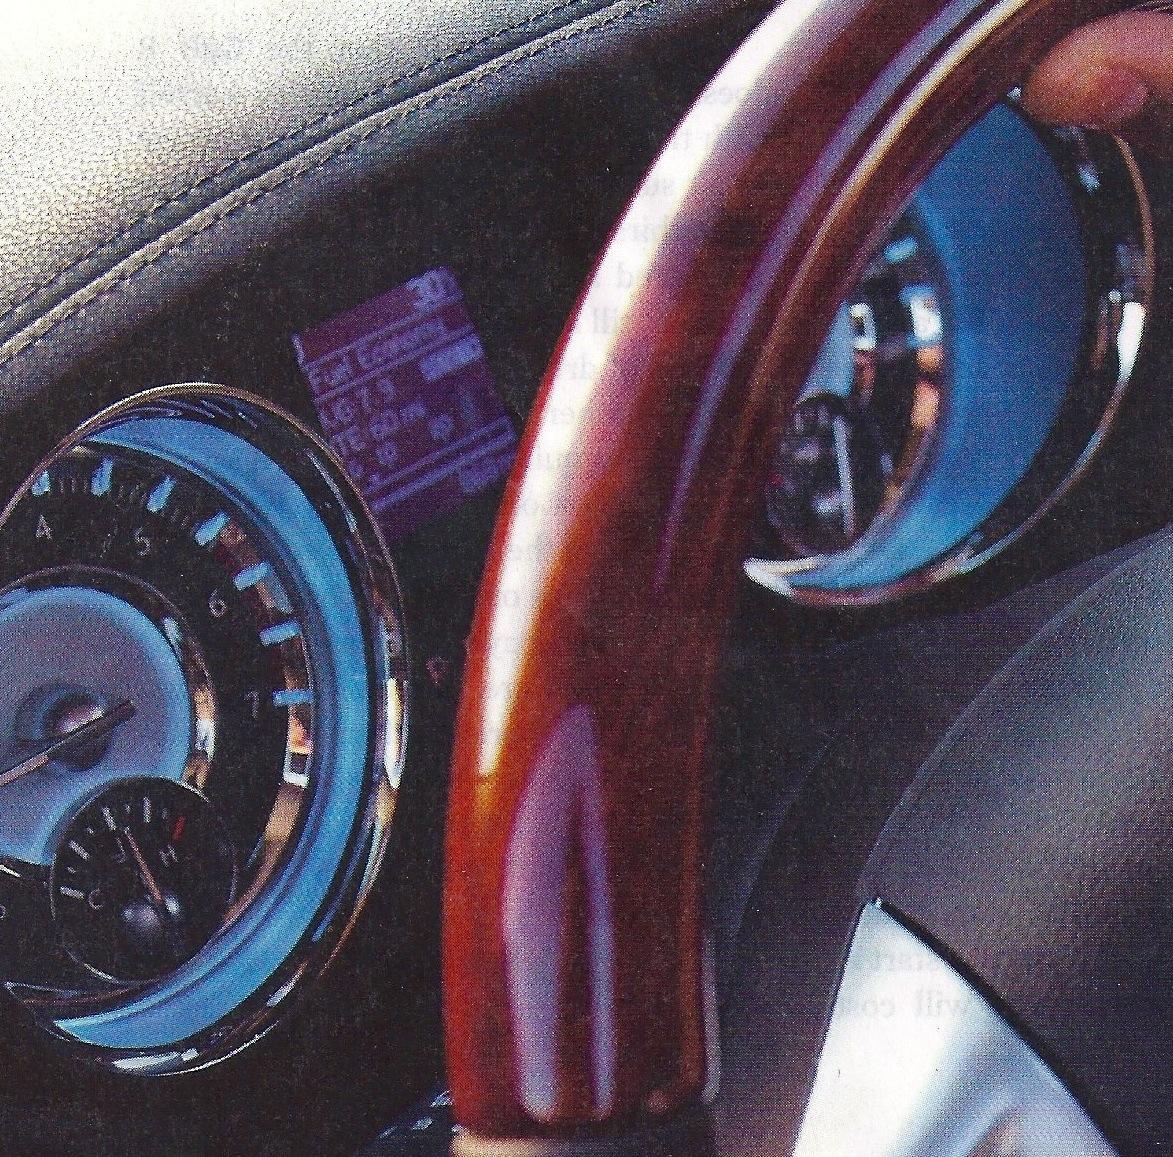 Chrysler 300 Fuel Economy